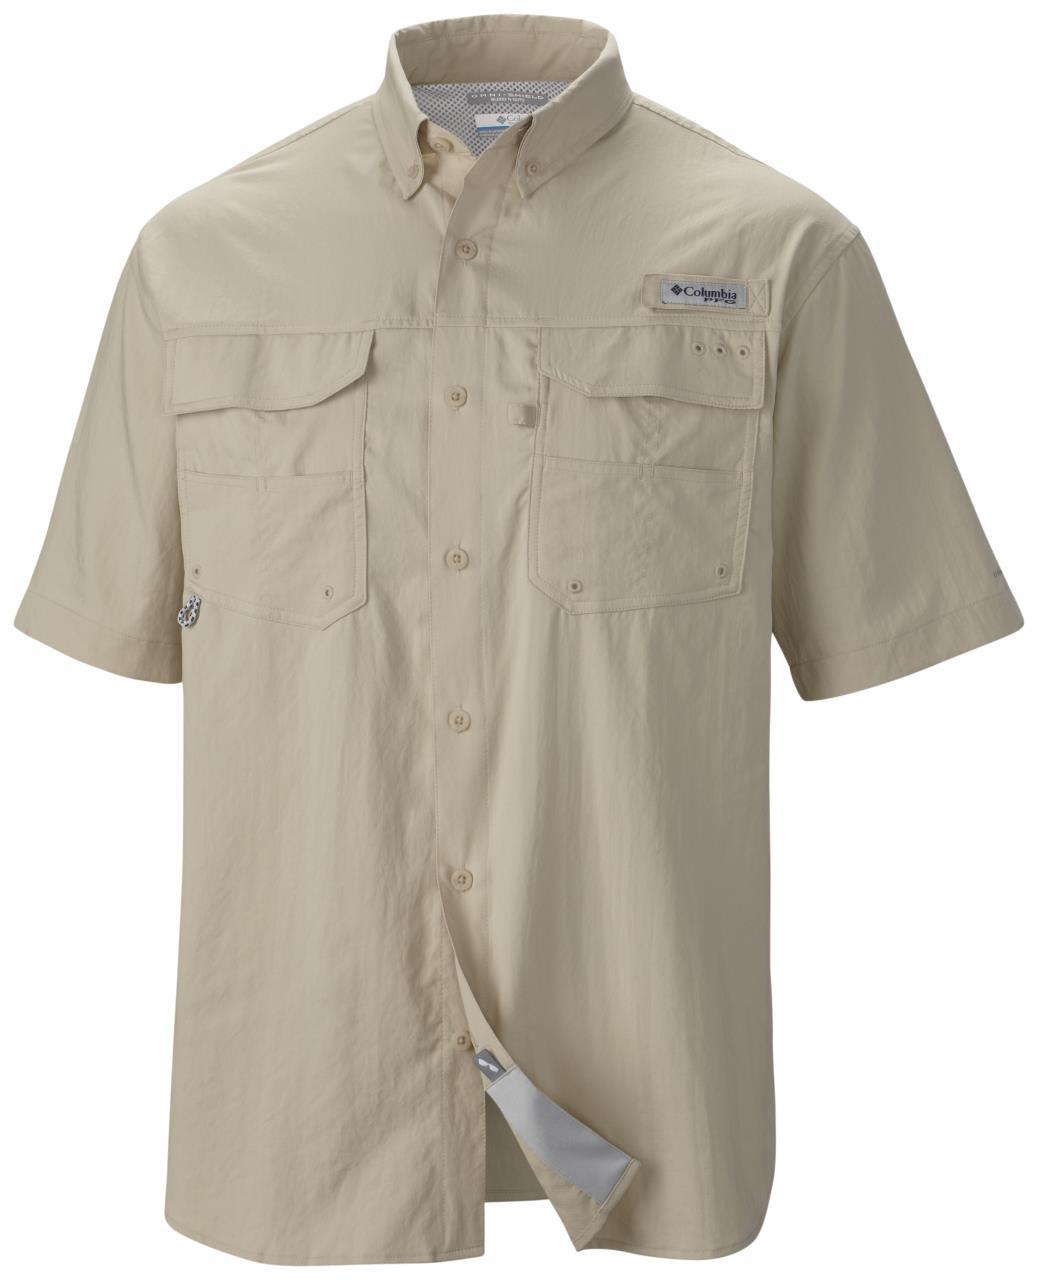 630b58a6 Columbia Men's PFG Blood and Guts S/S Woven Shirts - 888458870631